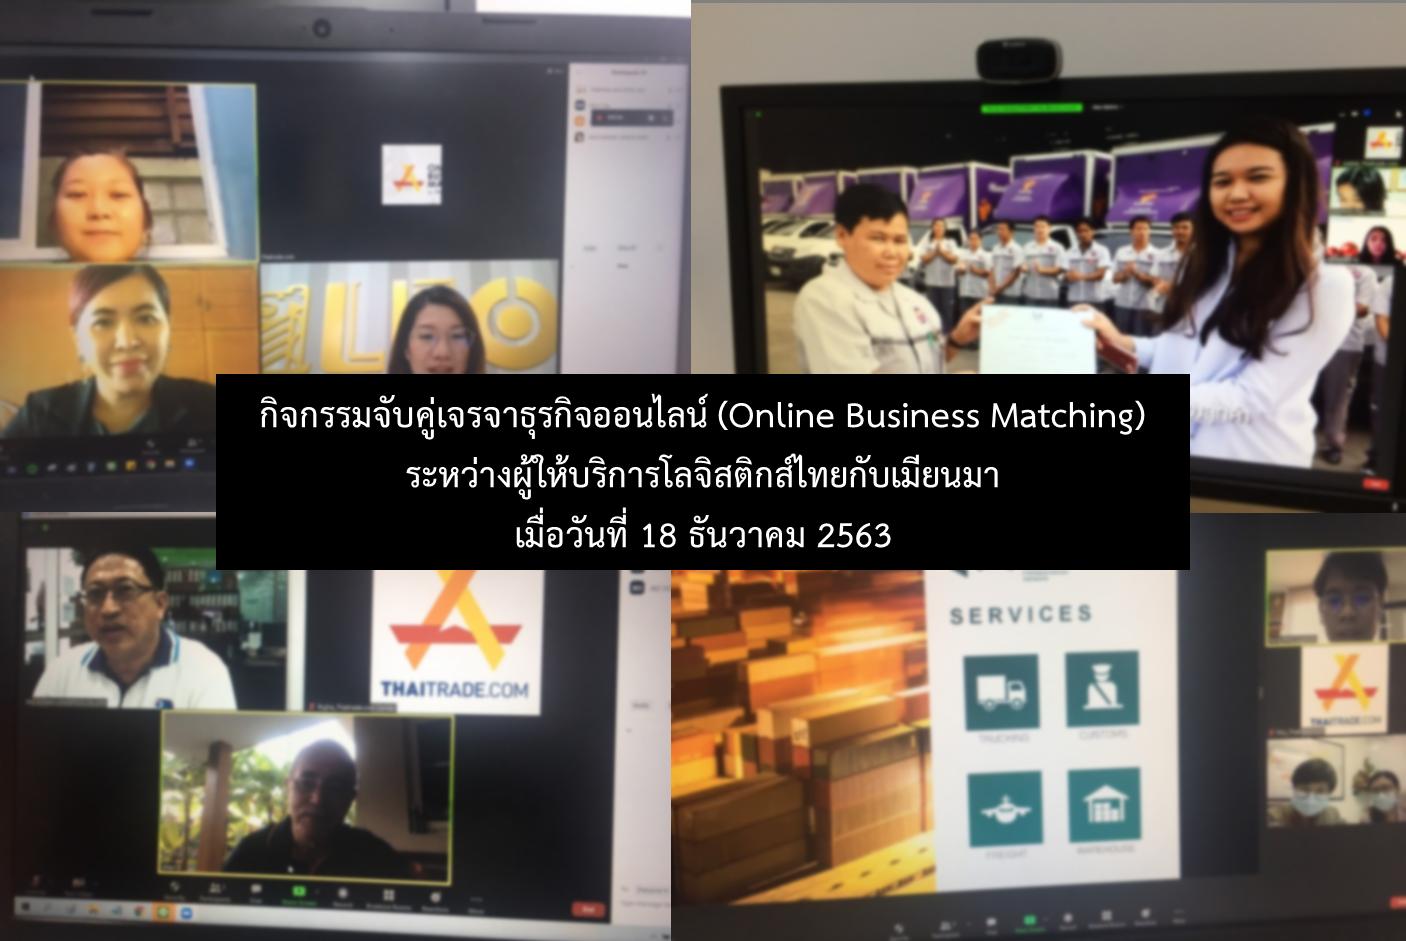 DITP จัดกิจกรรมจับคู่เจรจาธุรกิจออนไลน์ (Online Business Matching) ระหว่างผู้ให้บริการโลจิสติกส์ไทย กับผู้ให้บริการโลจิสติกส์ประเทศกลุ่มลุ่มแม่น้ำโขง (ประเทศเมียนมา)